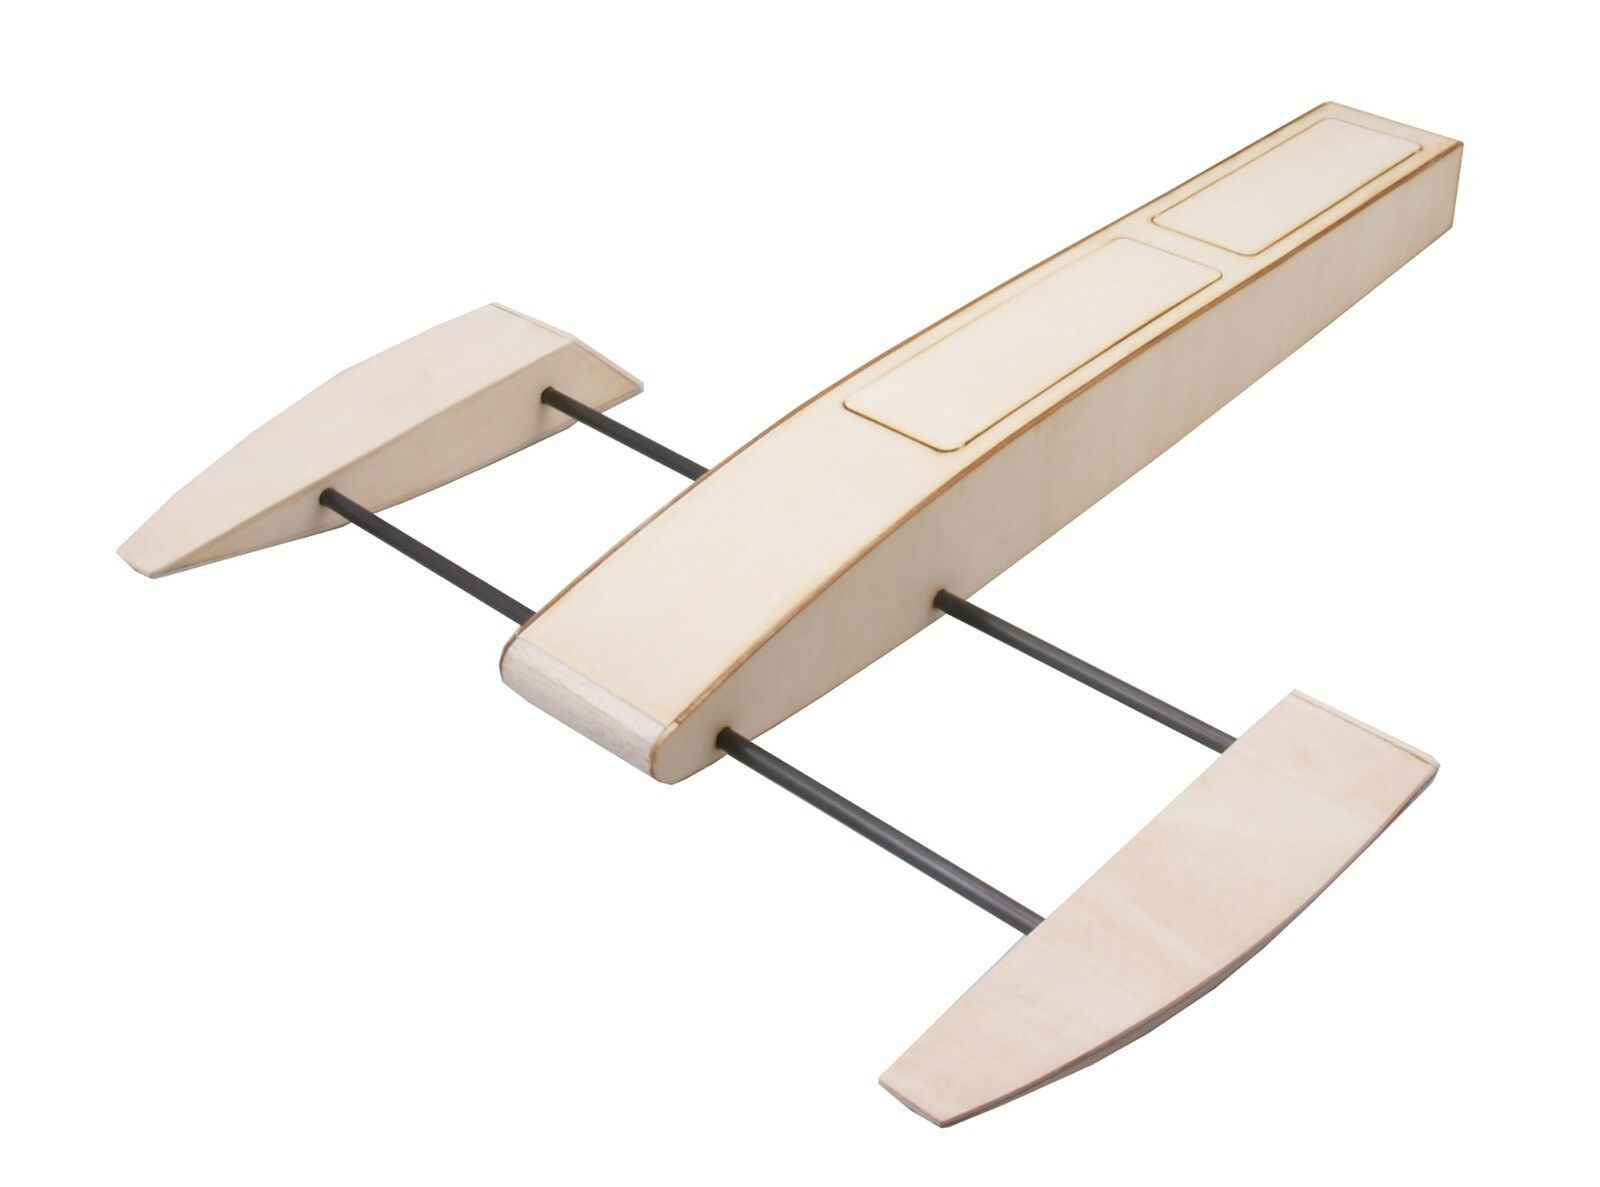 Rc sperrholz ausleger Stiefel aus holz sponson race Stiefel 495mm w   macht schacht fg ruder